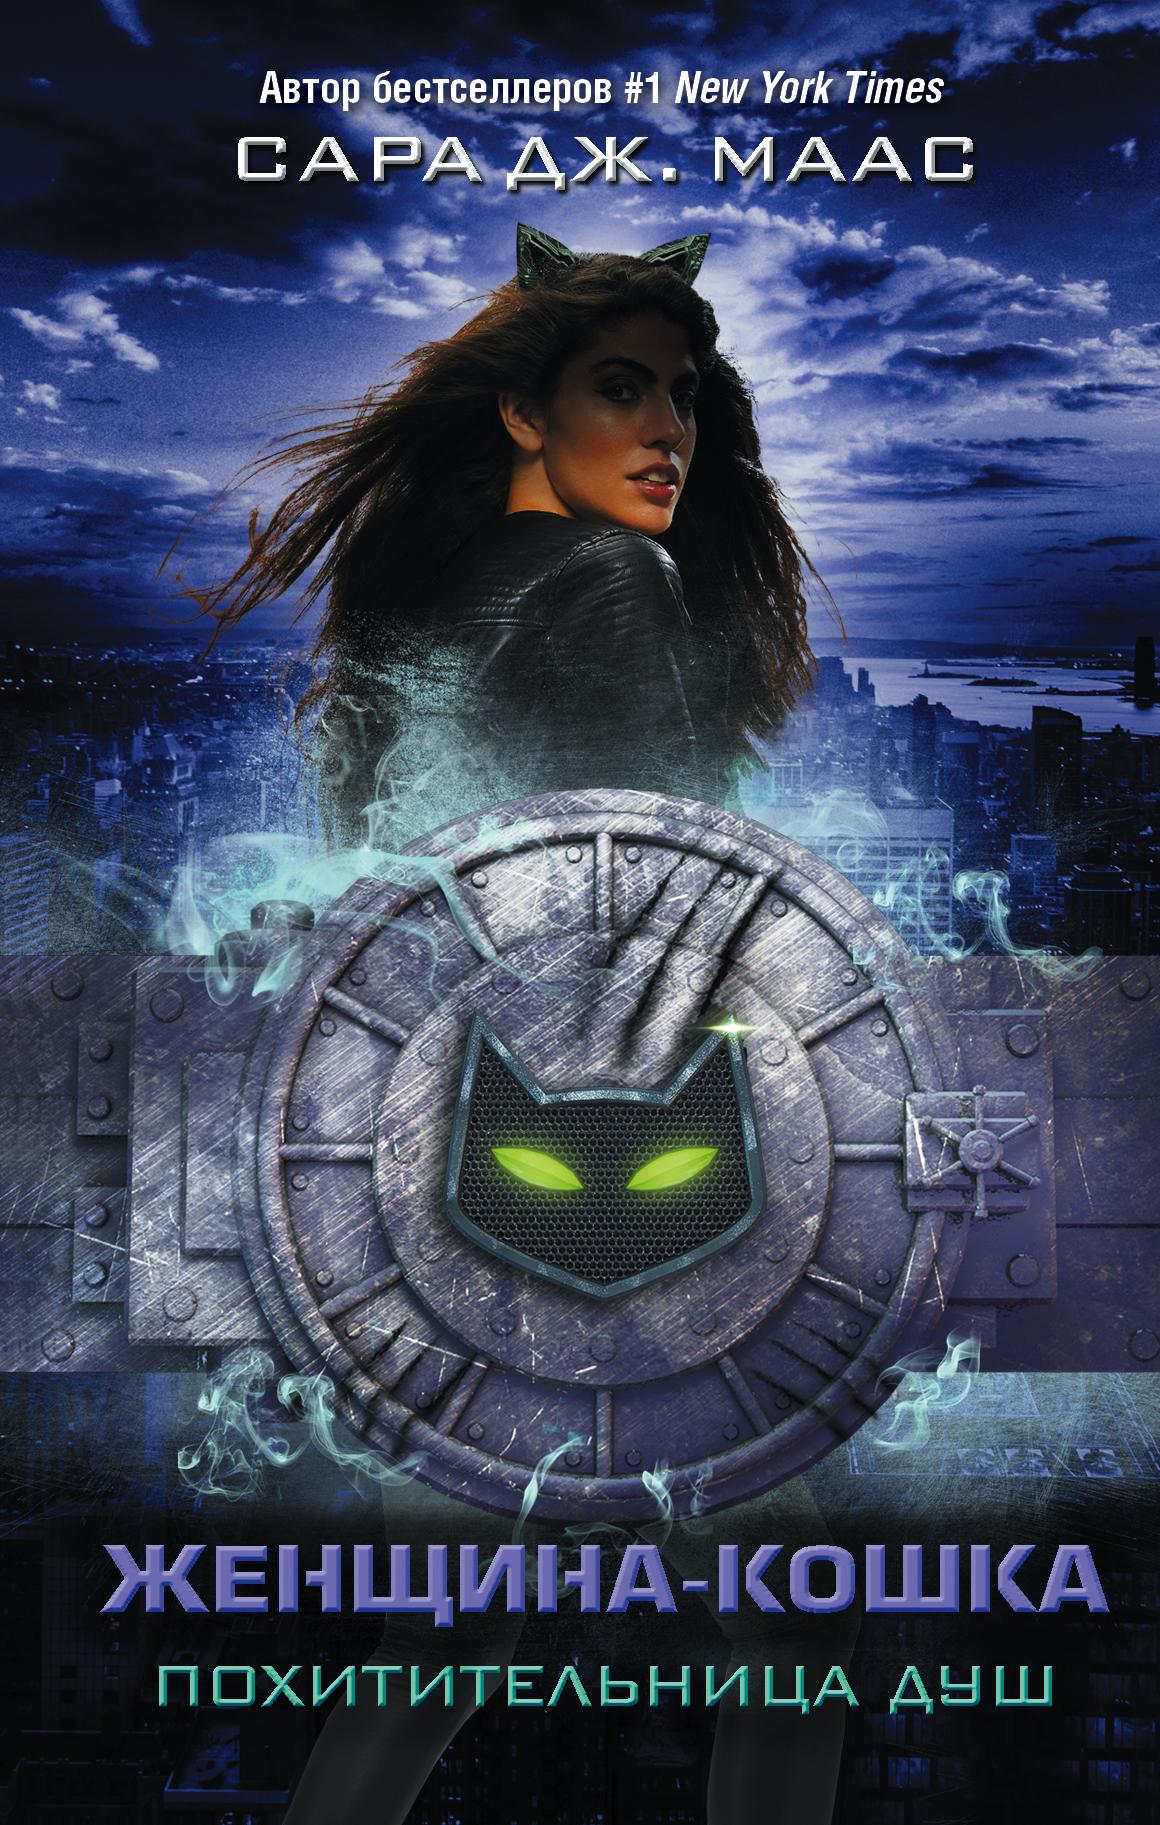 Женщина-Кошка. Похитительница душ / Catwoman: Soulstealer Маас Сара Дж